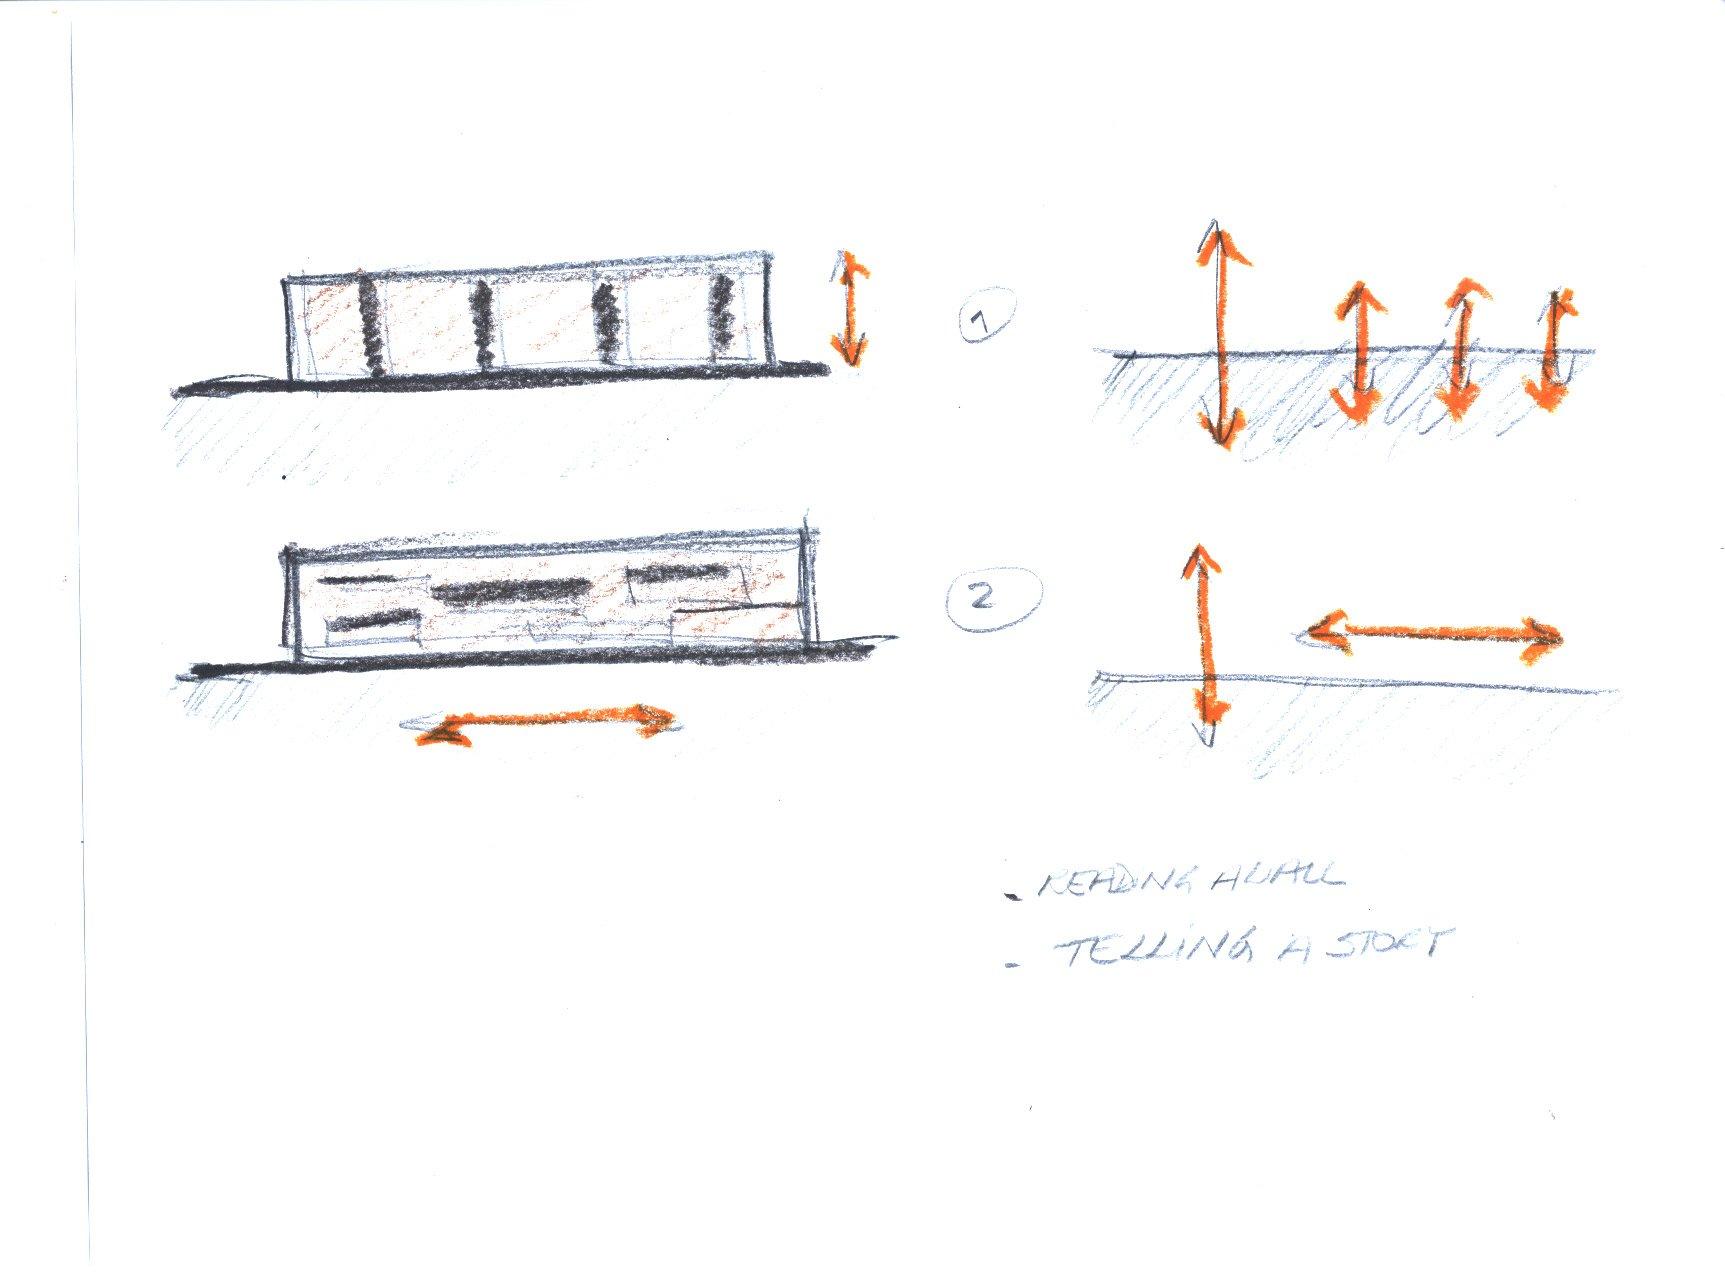 Concept © Shinberg.Levinas Architects